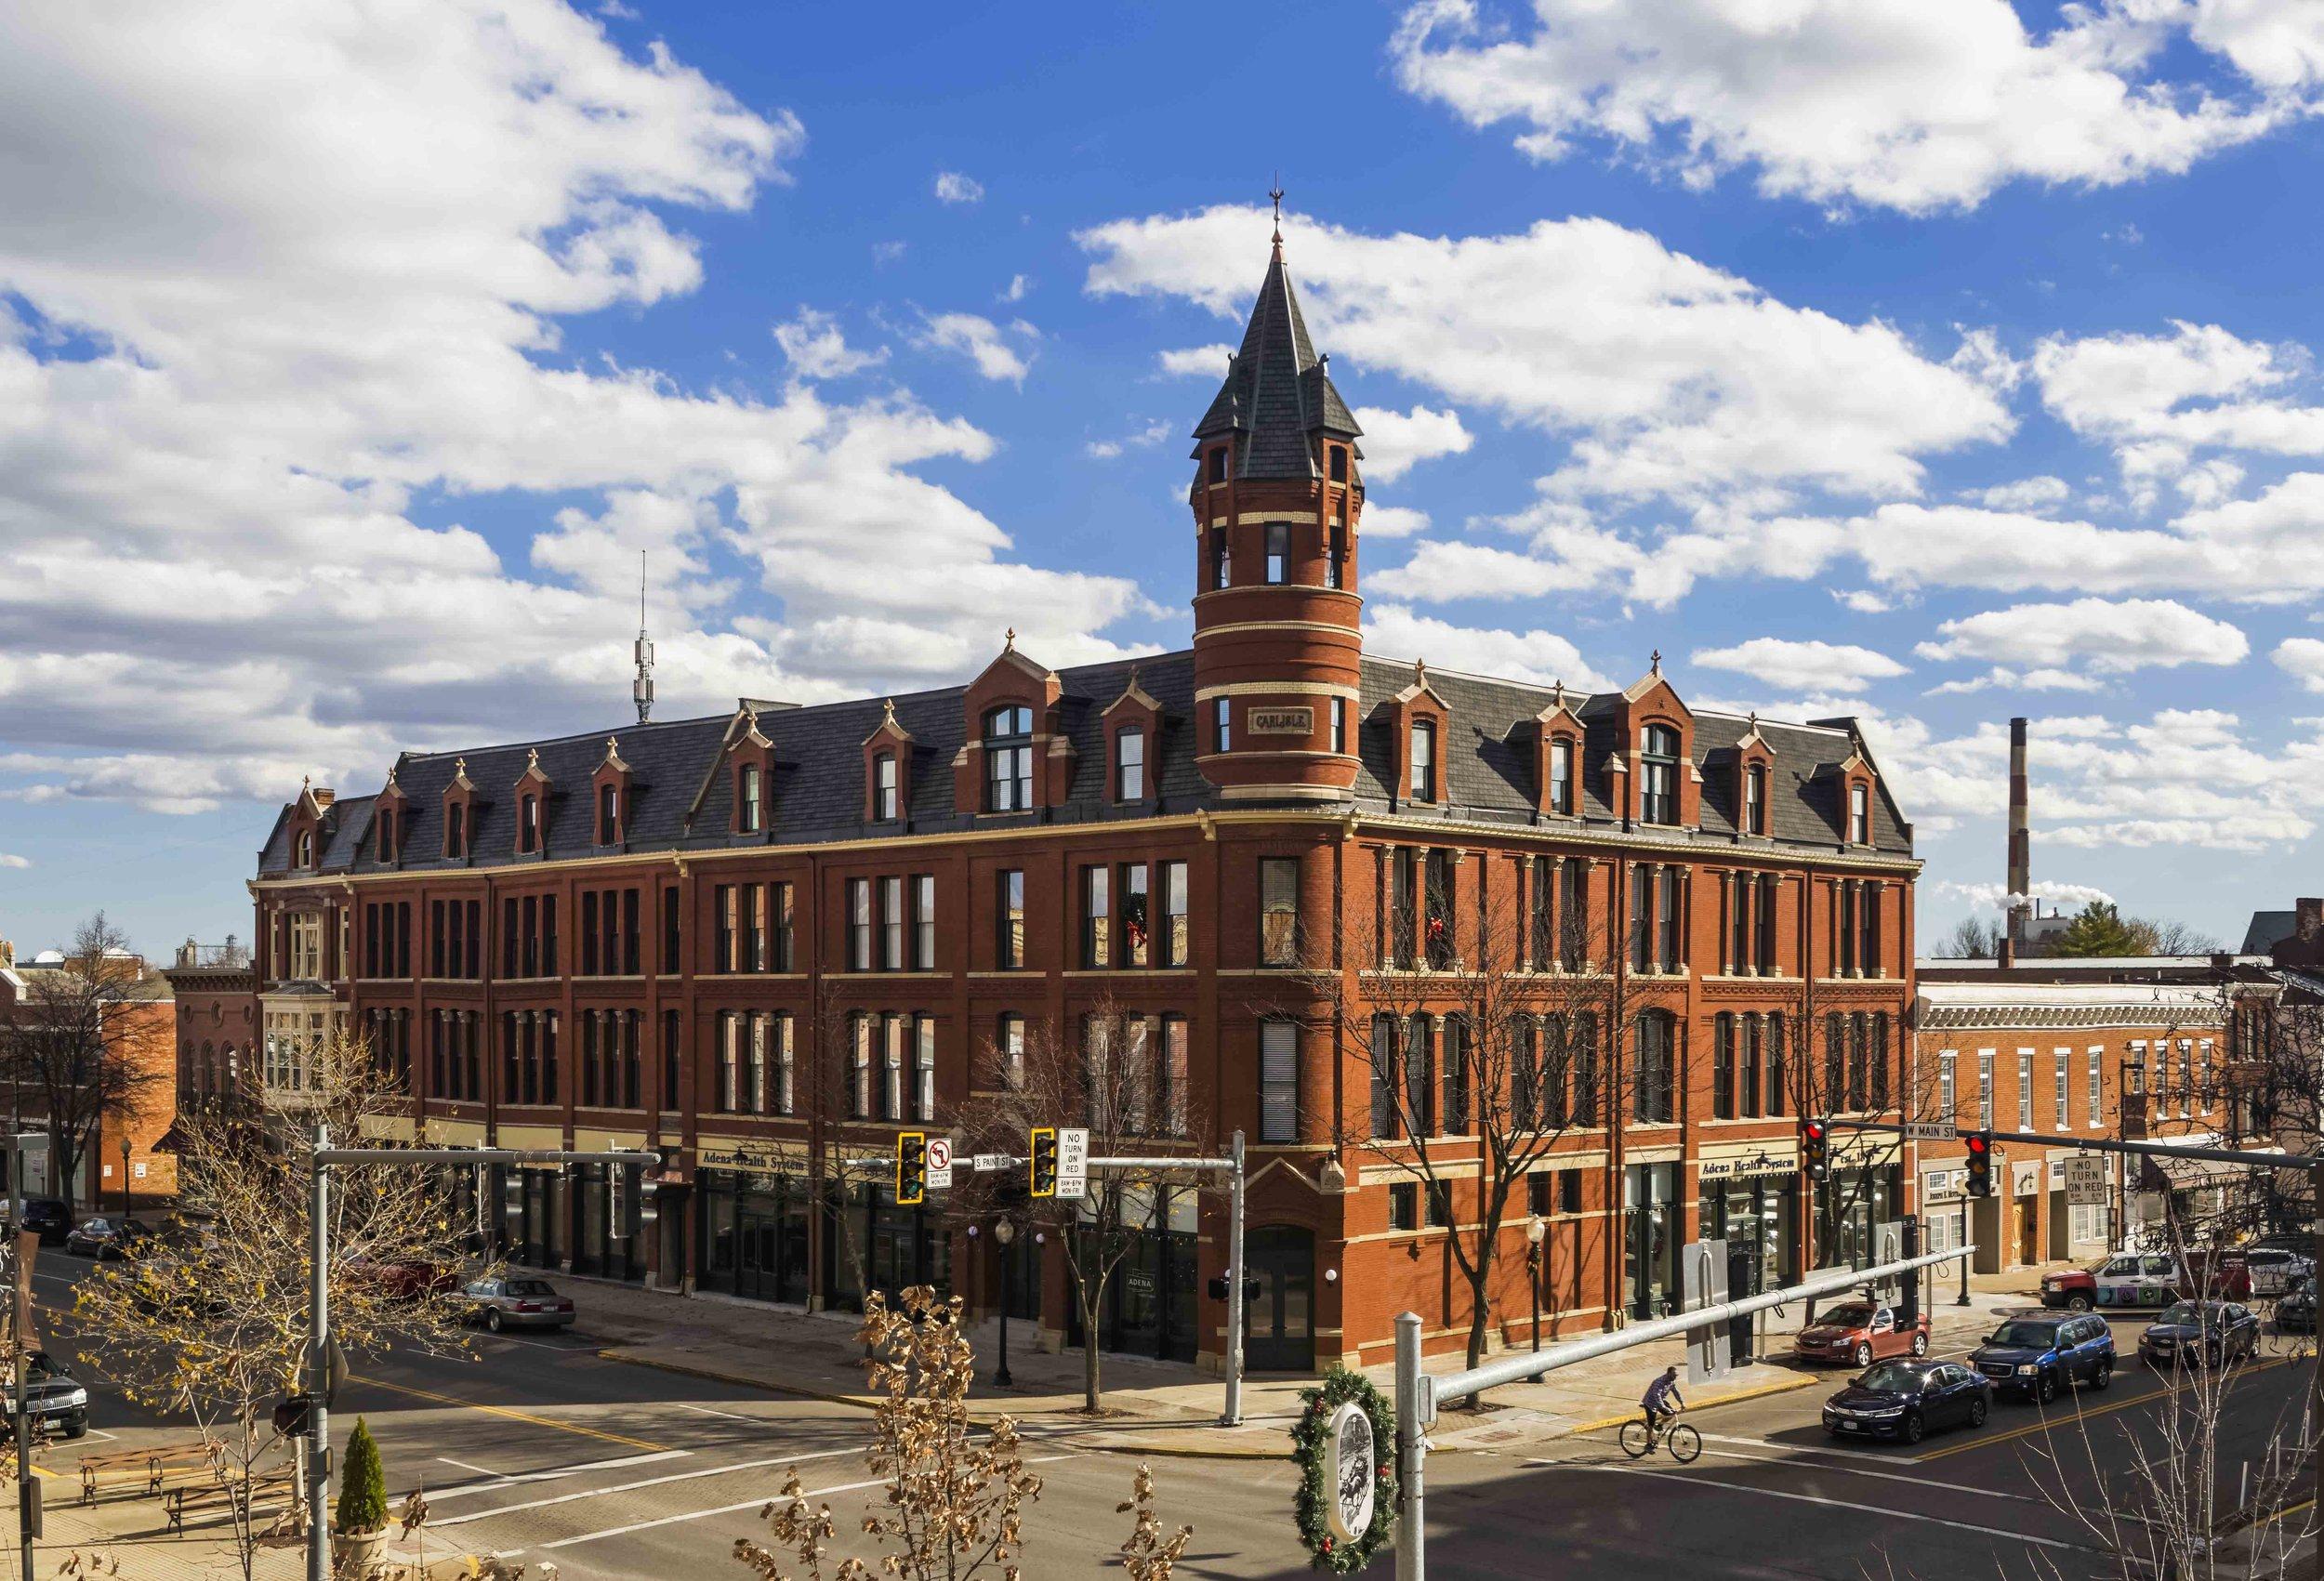 Architect: The Carlisle Building